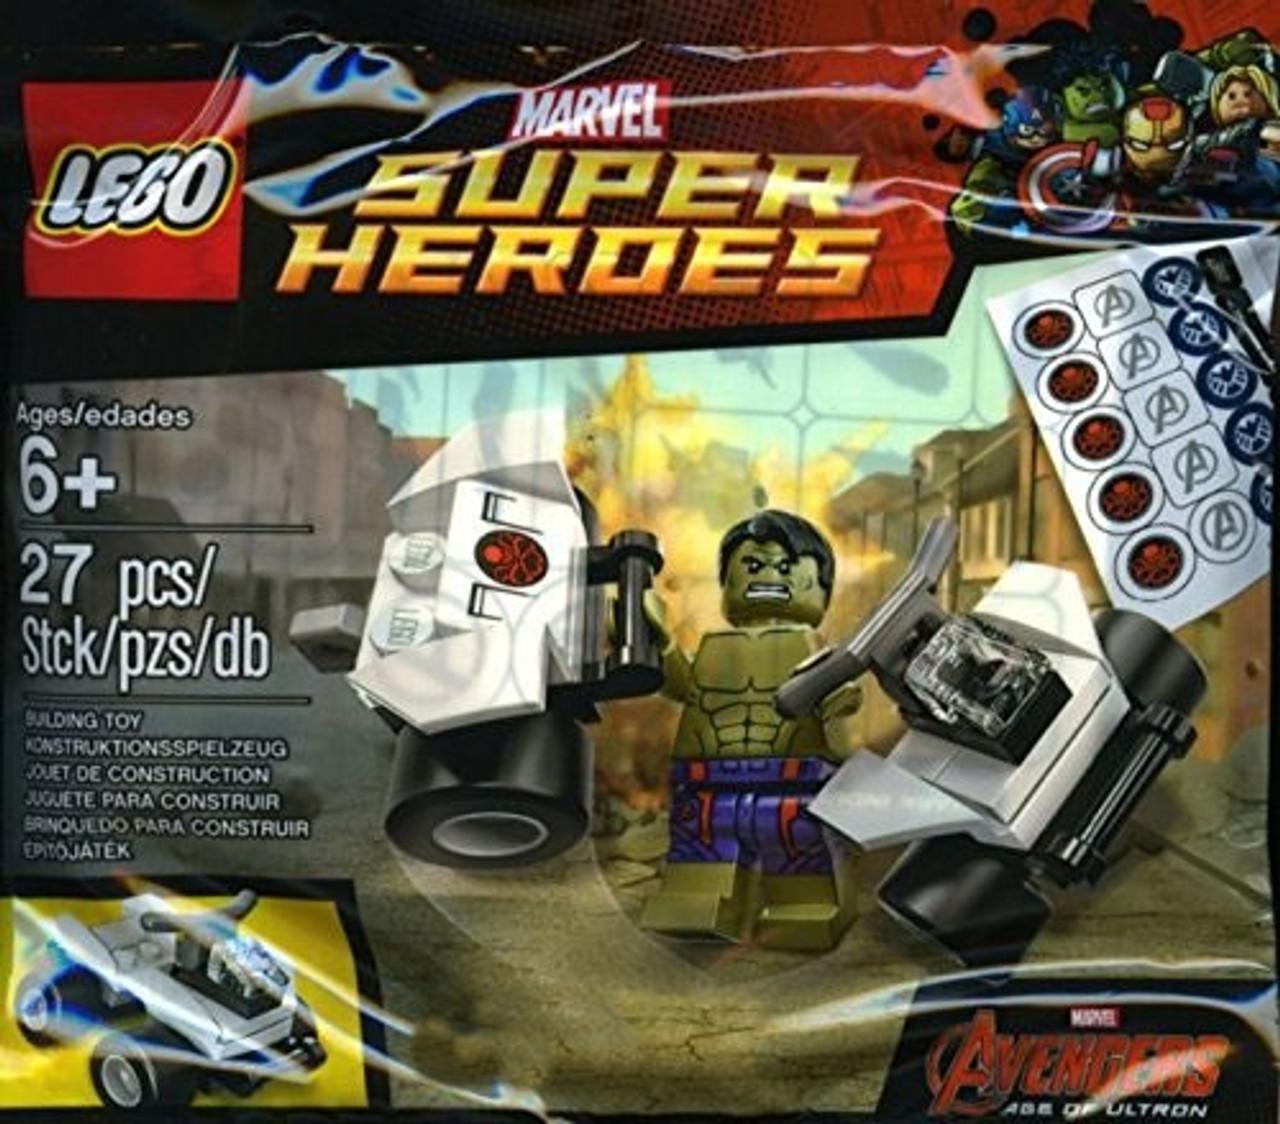 LEGO Marvel Avengers Age of Ultron Hulk Exclusive Mini Set 5003084 ...